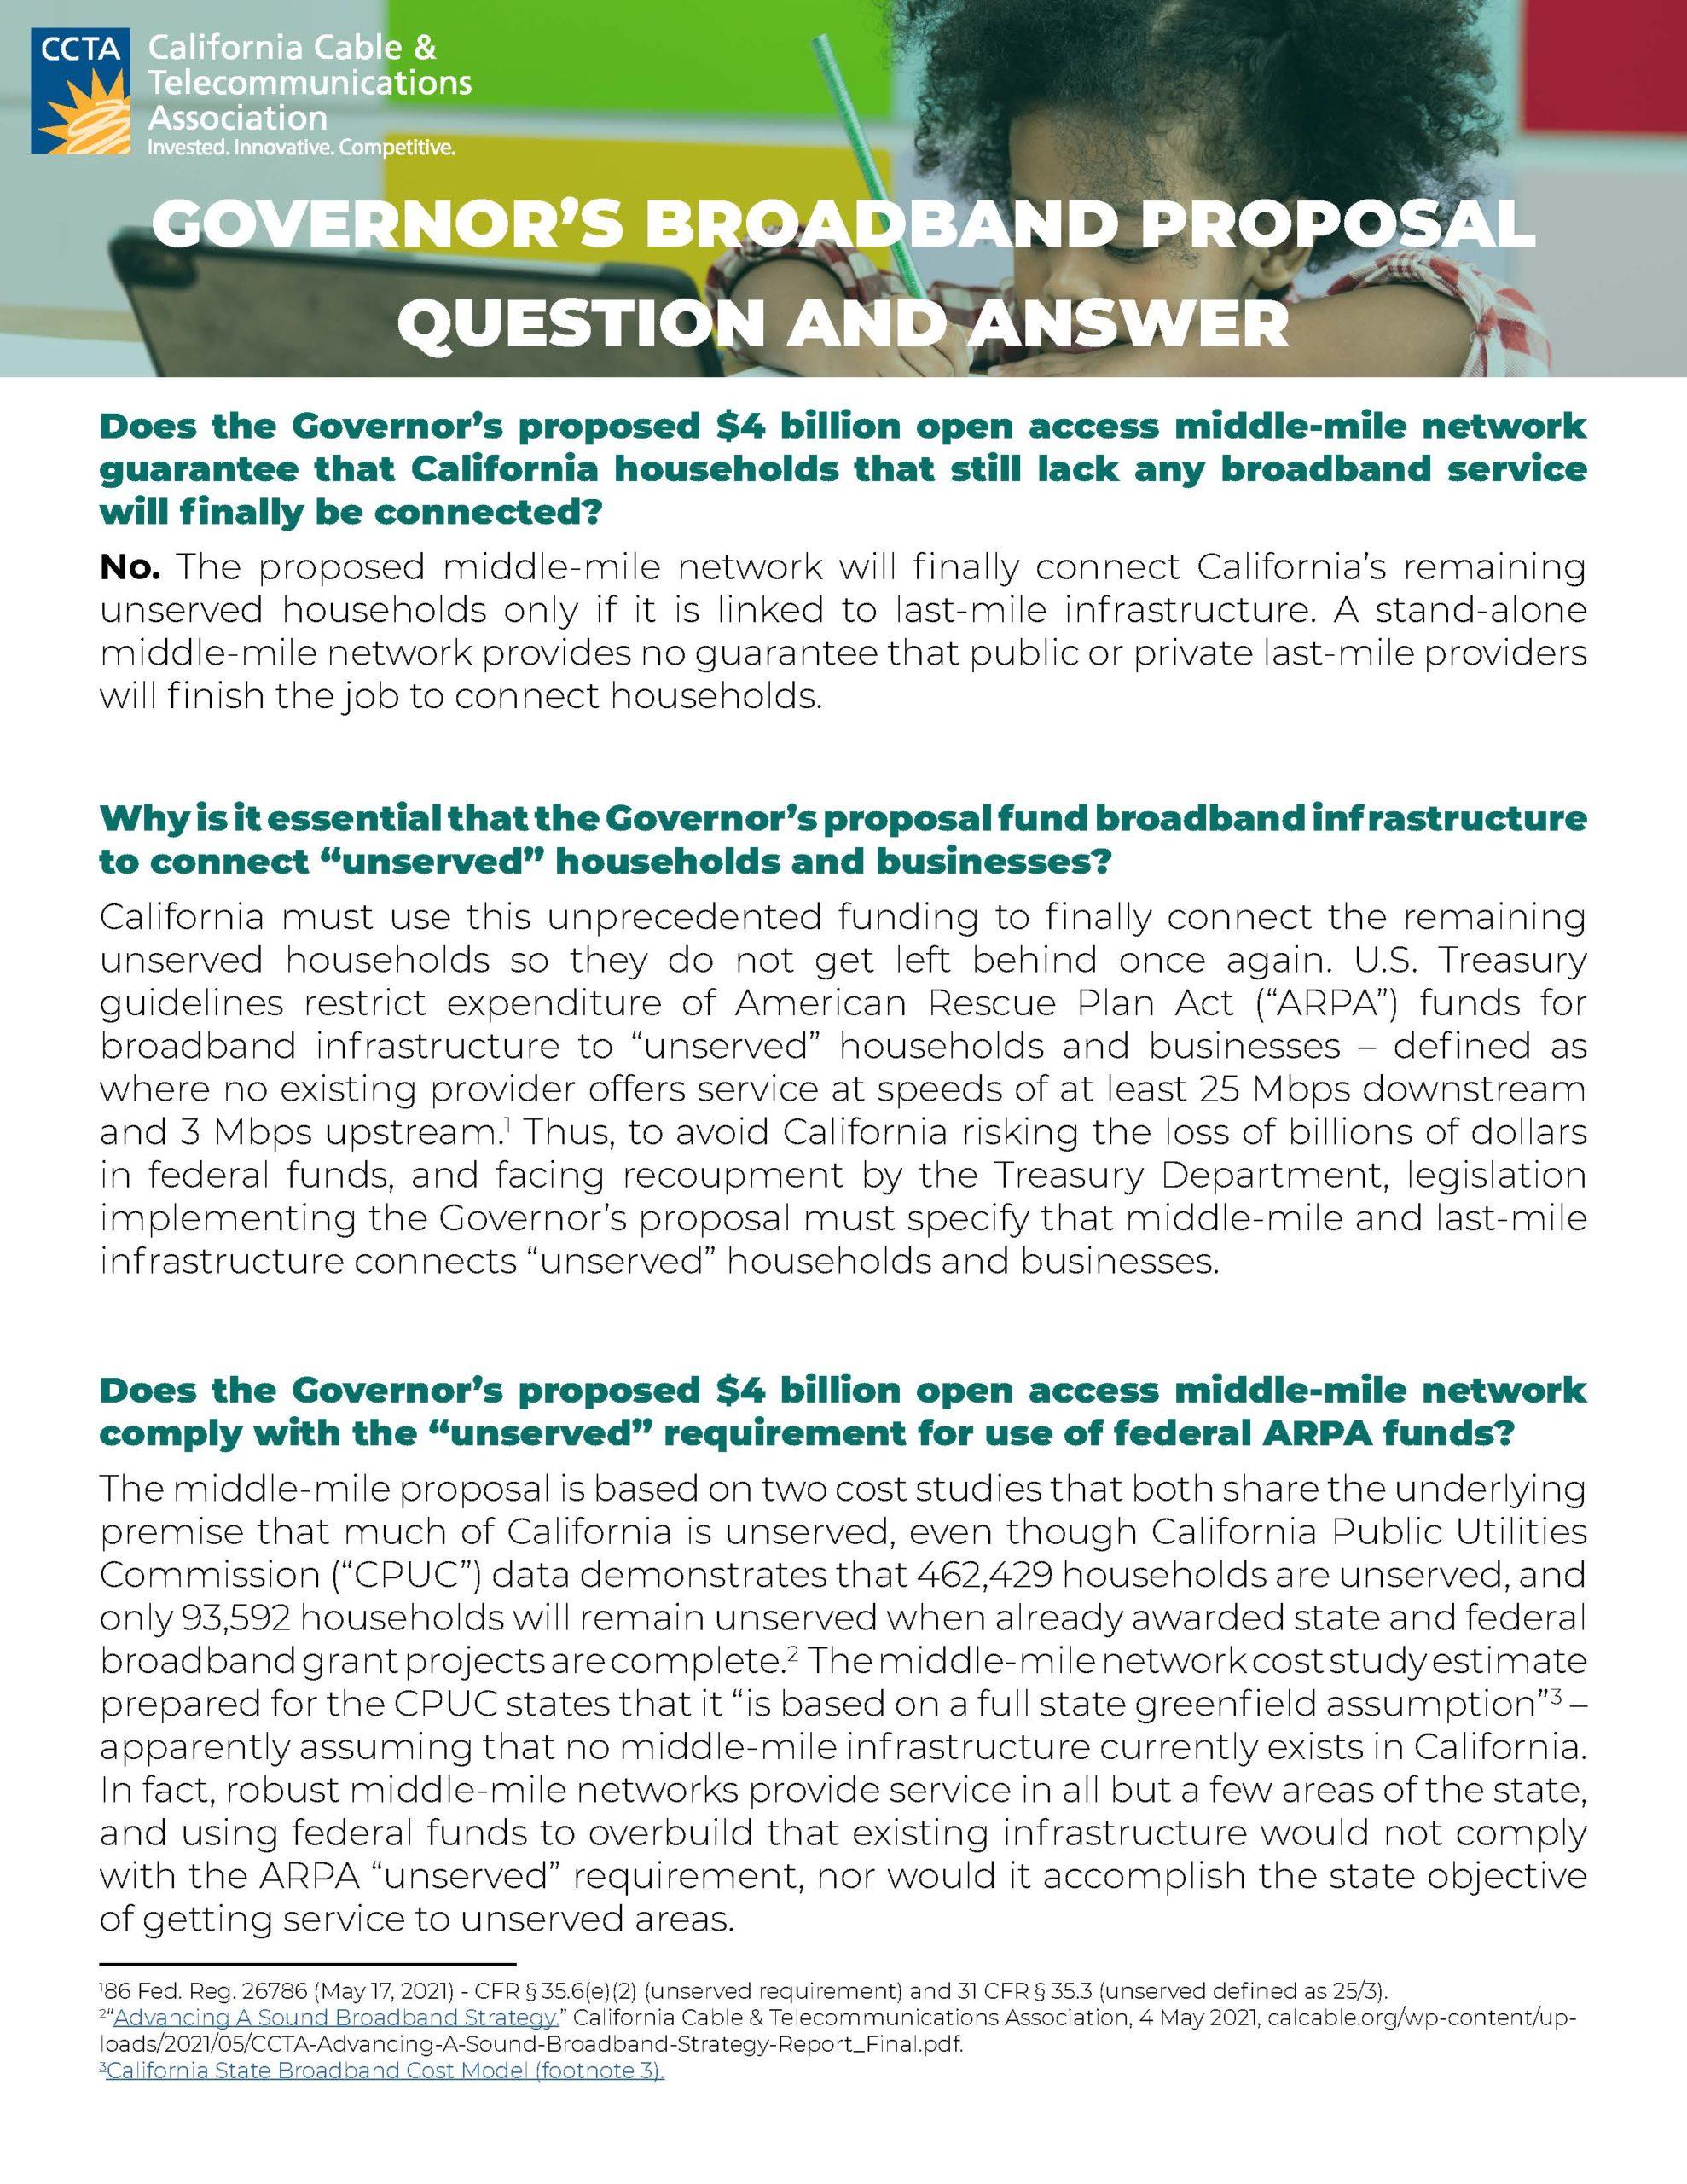 CCTA Broadband Proposal Q&A Fact Sheet_Final_Page_1